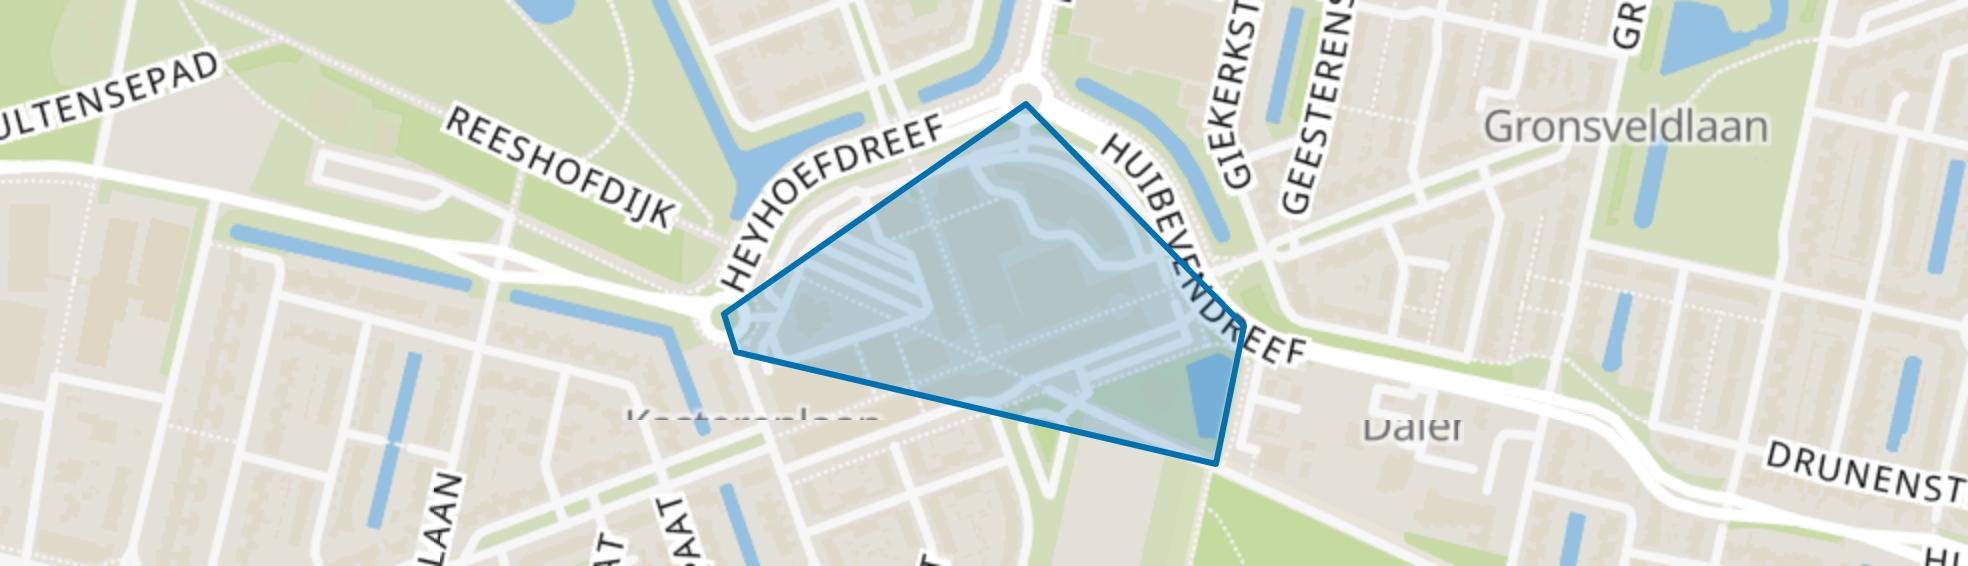 Heyhoef, Tilburg map